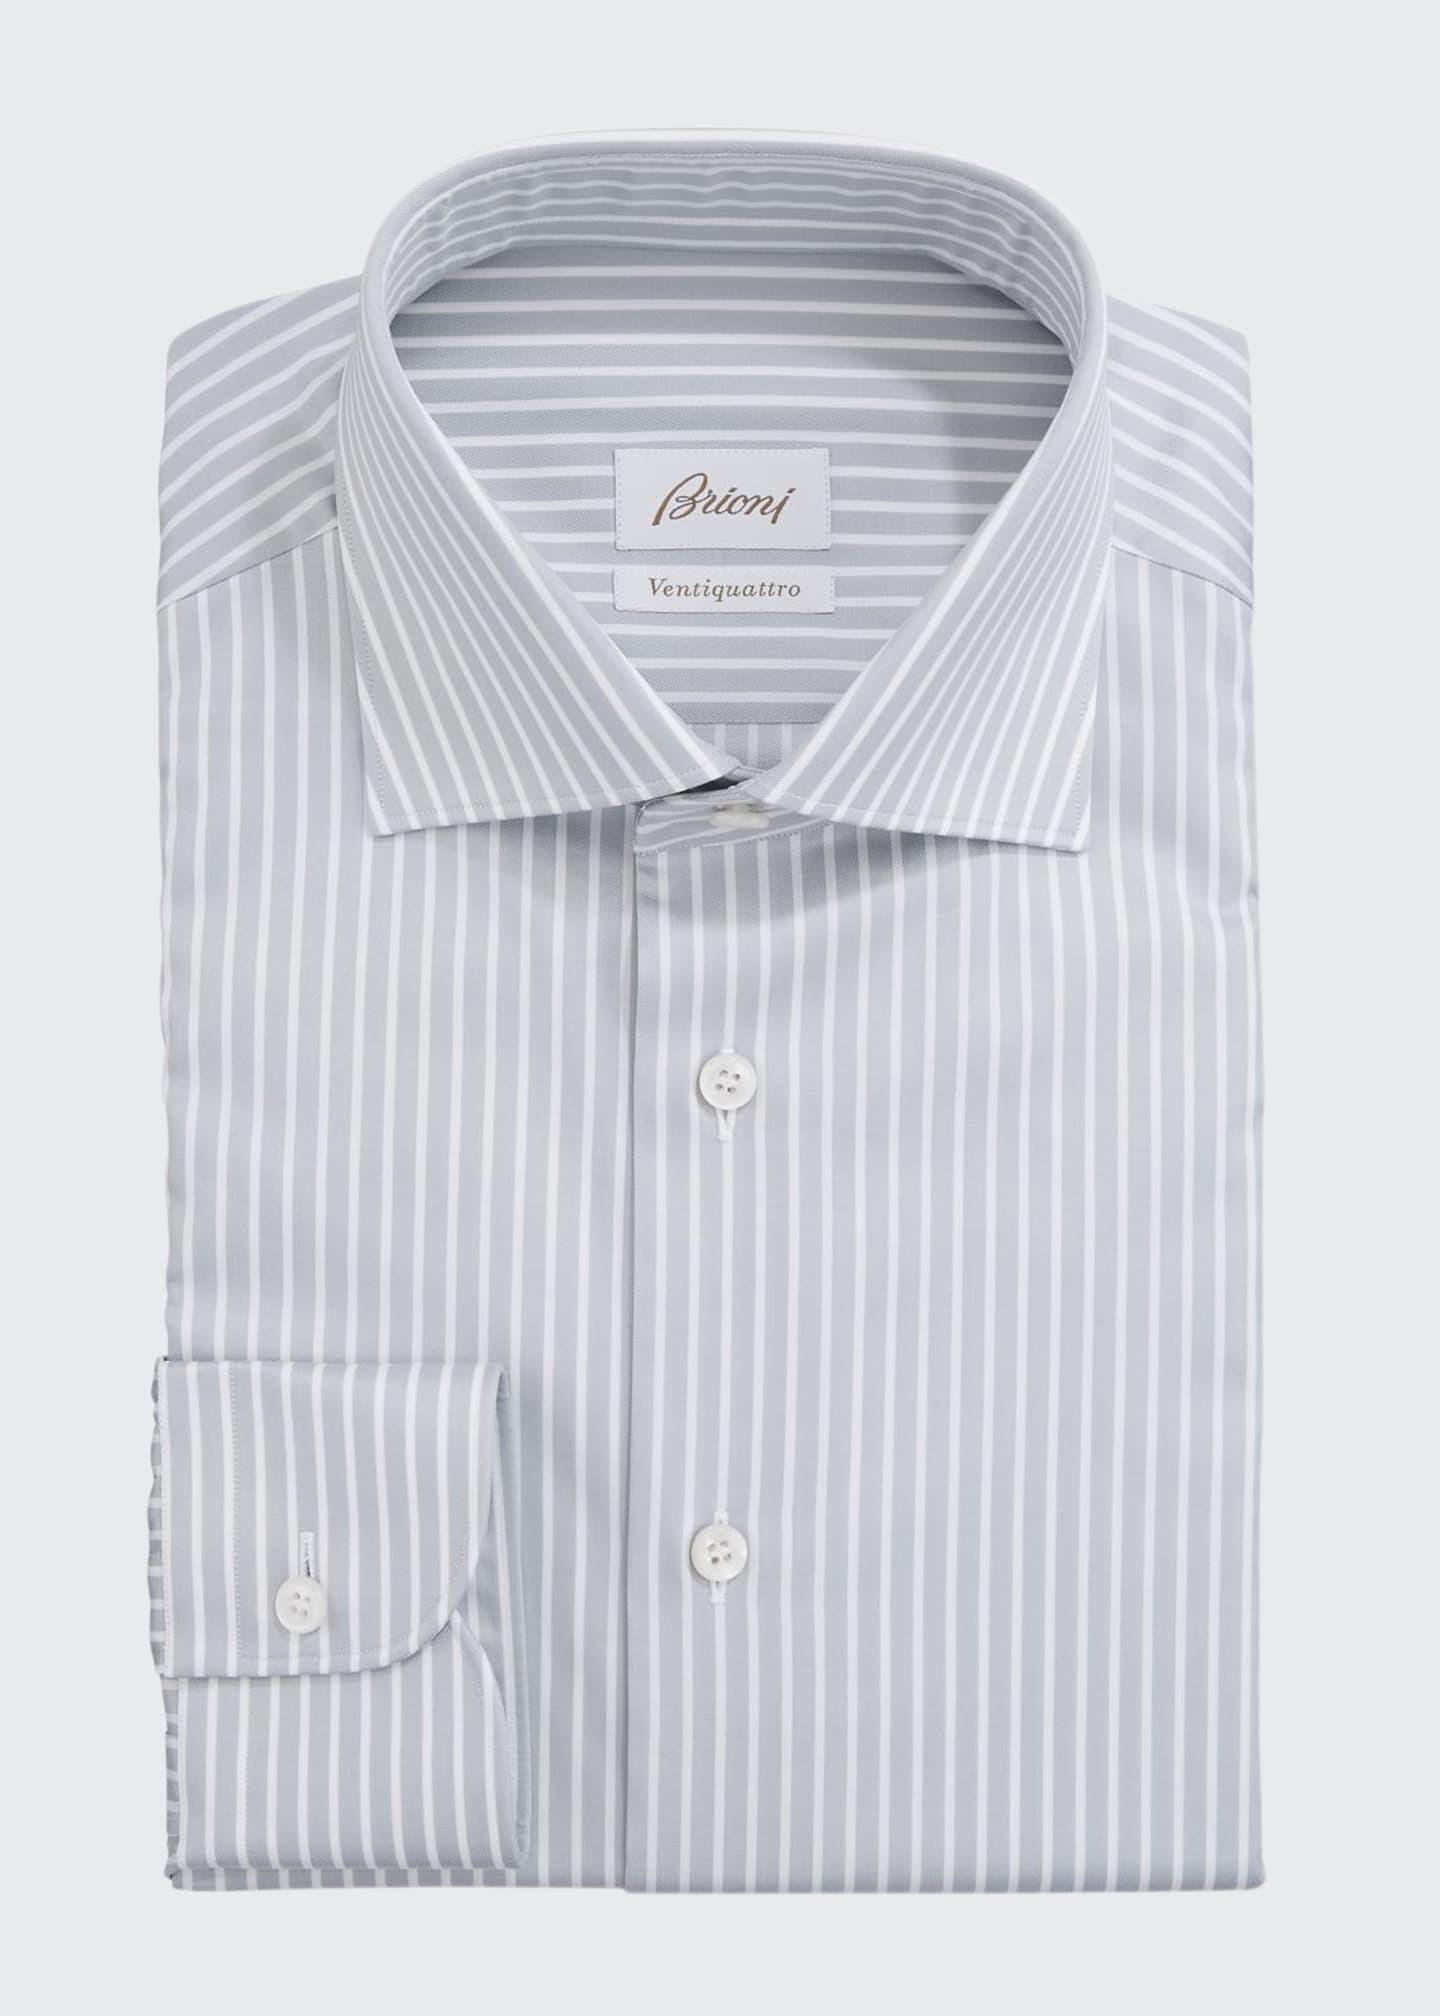 Brioni Men's Ventiquattro Striped Dress Shirt